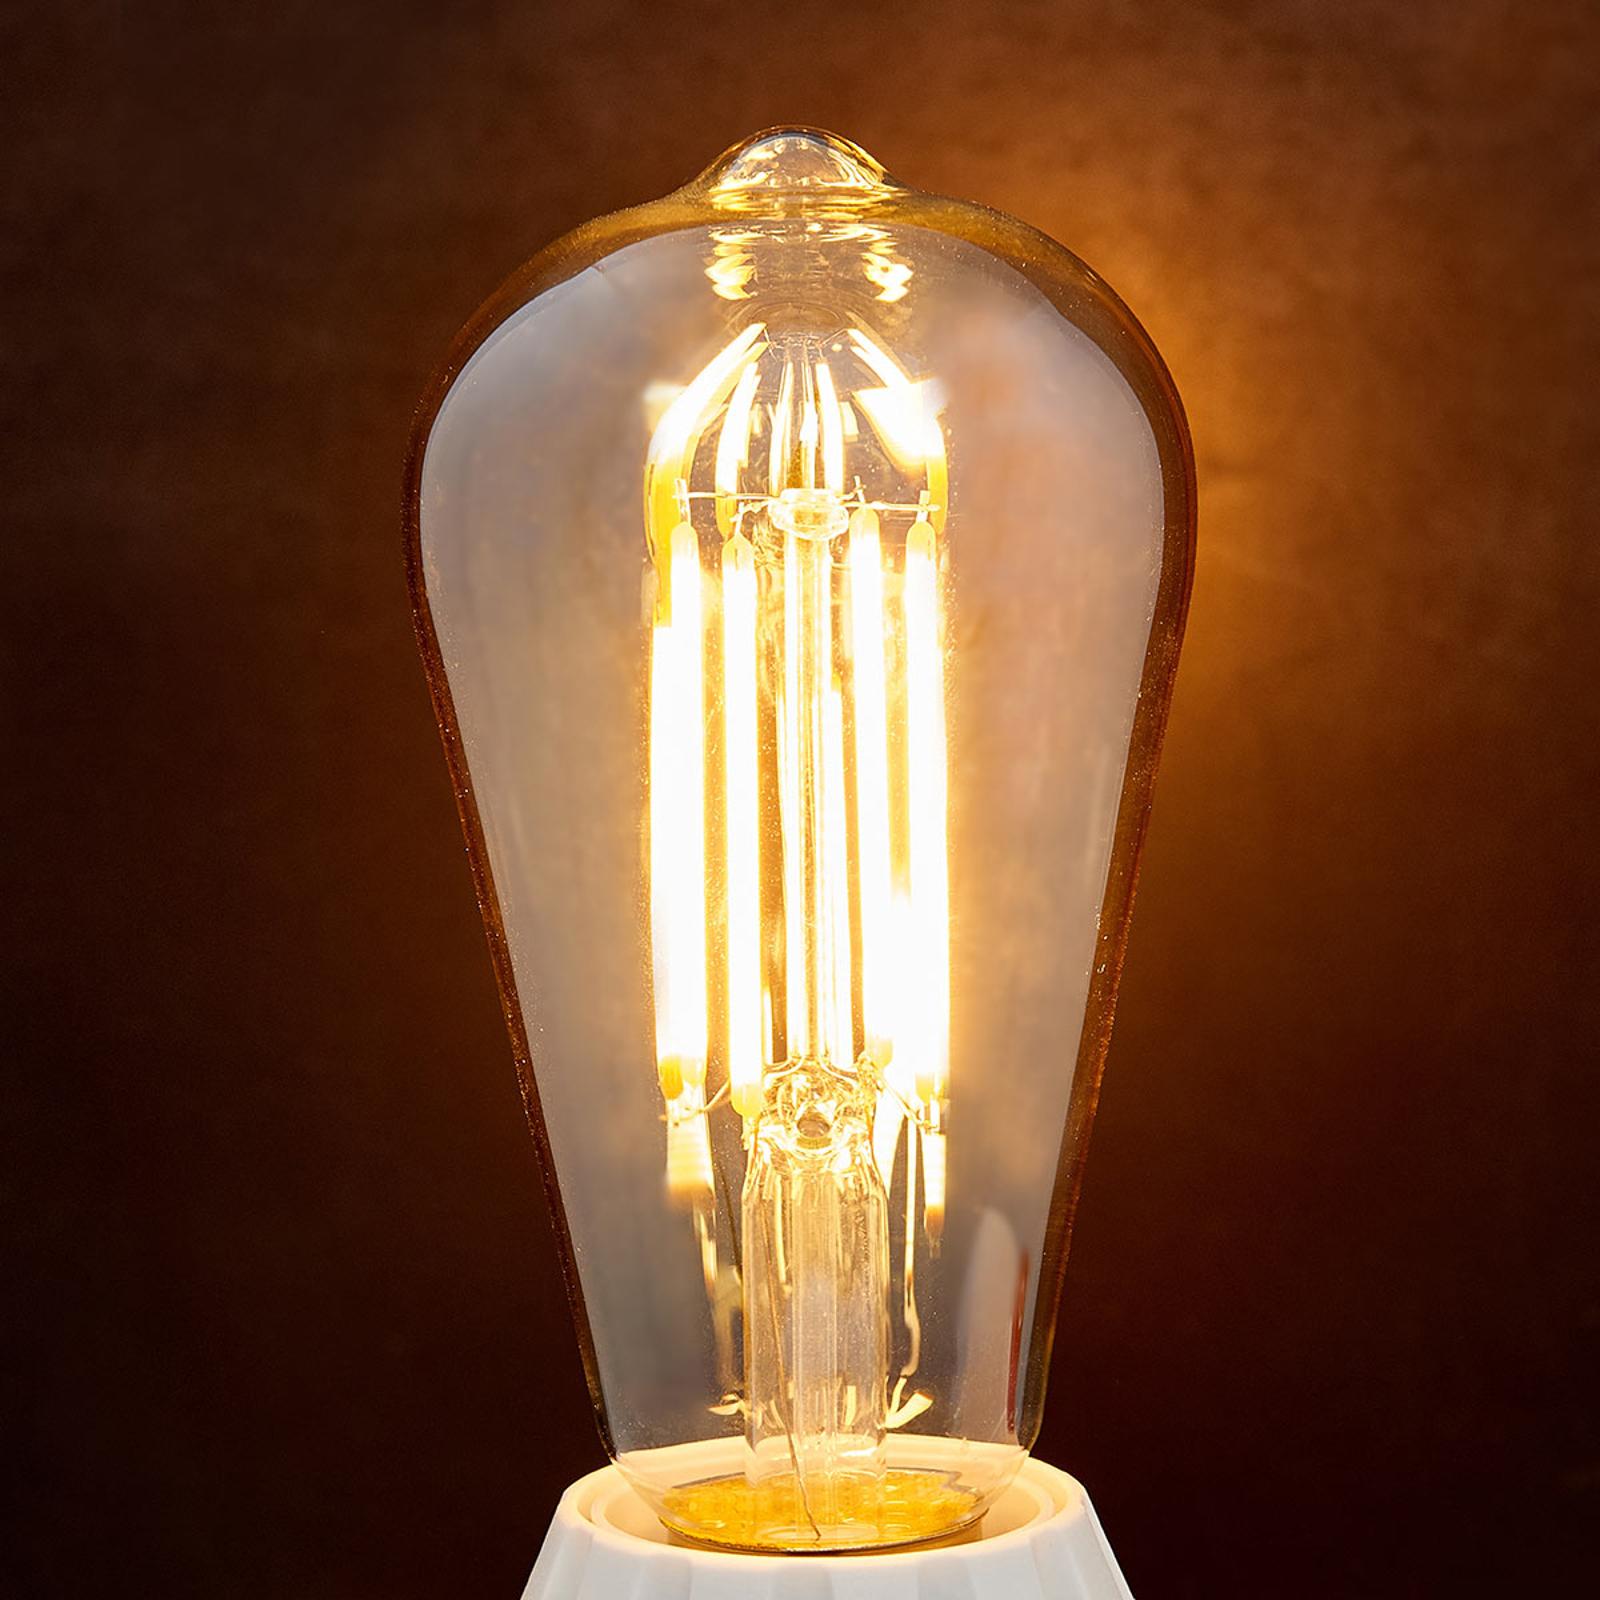 E27-LED-rustiikkilamppu 6 W 500 lm ambra 2 200 K